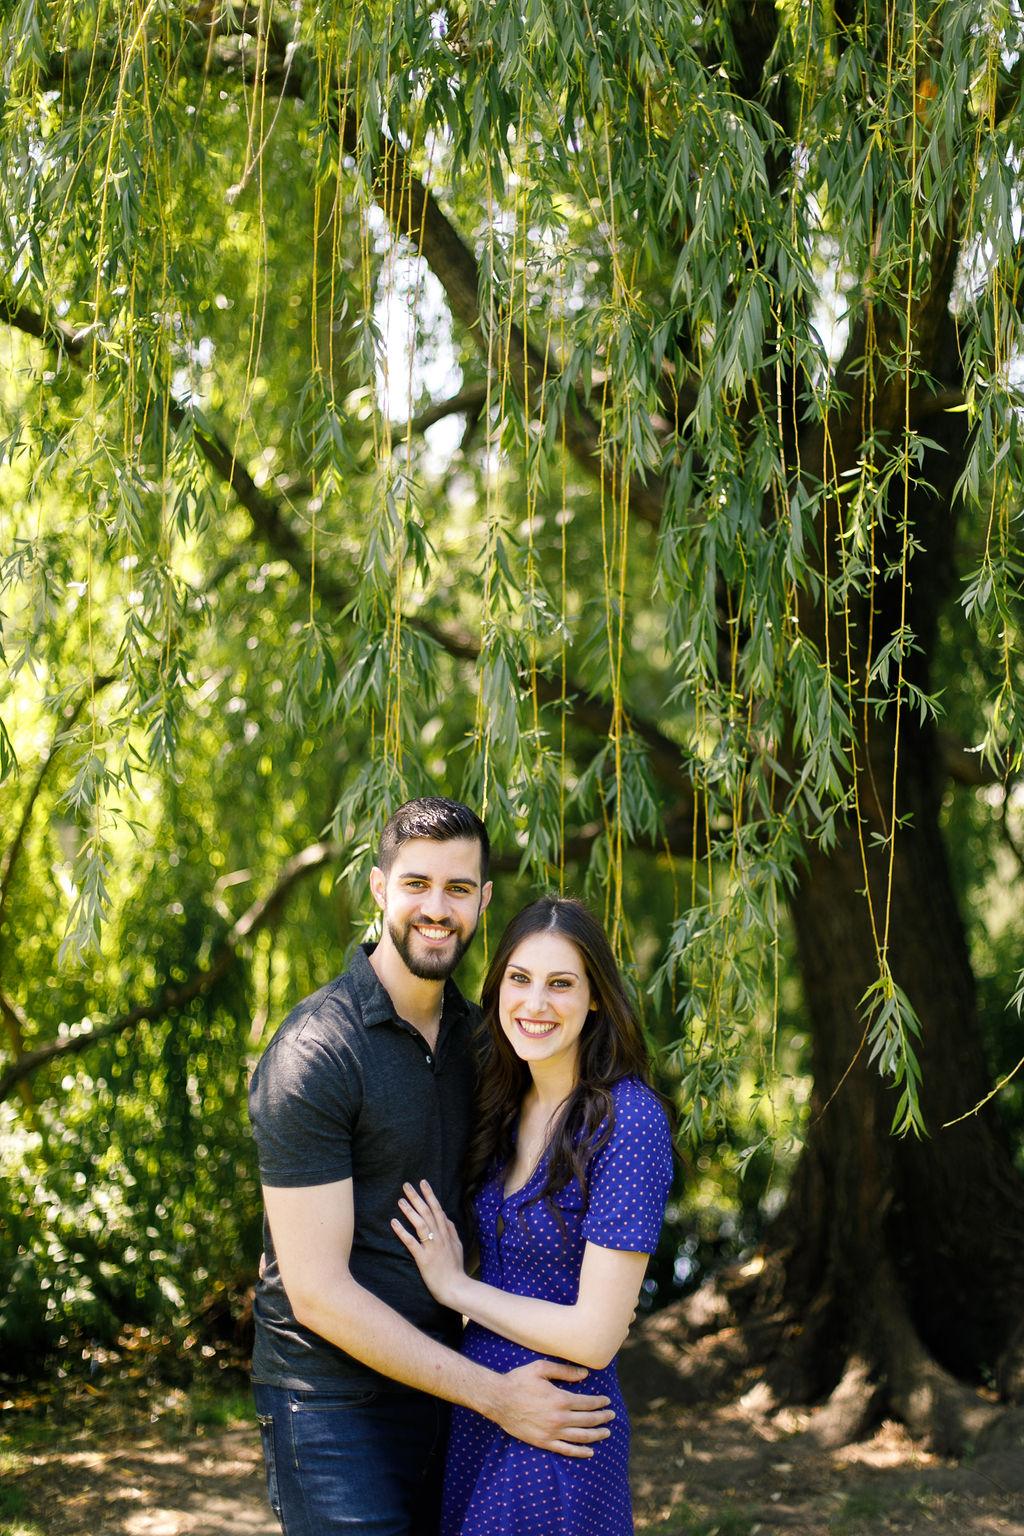 M&J Central Park NYC Engagement Shoot1.jpg